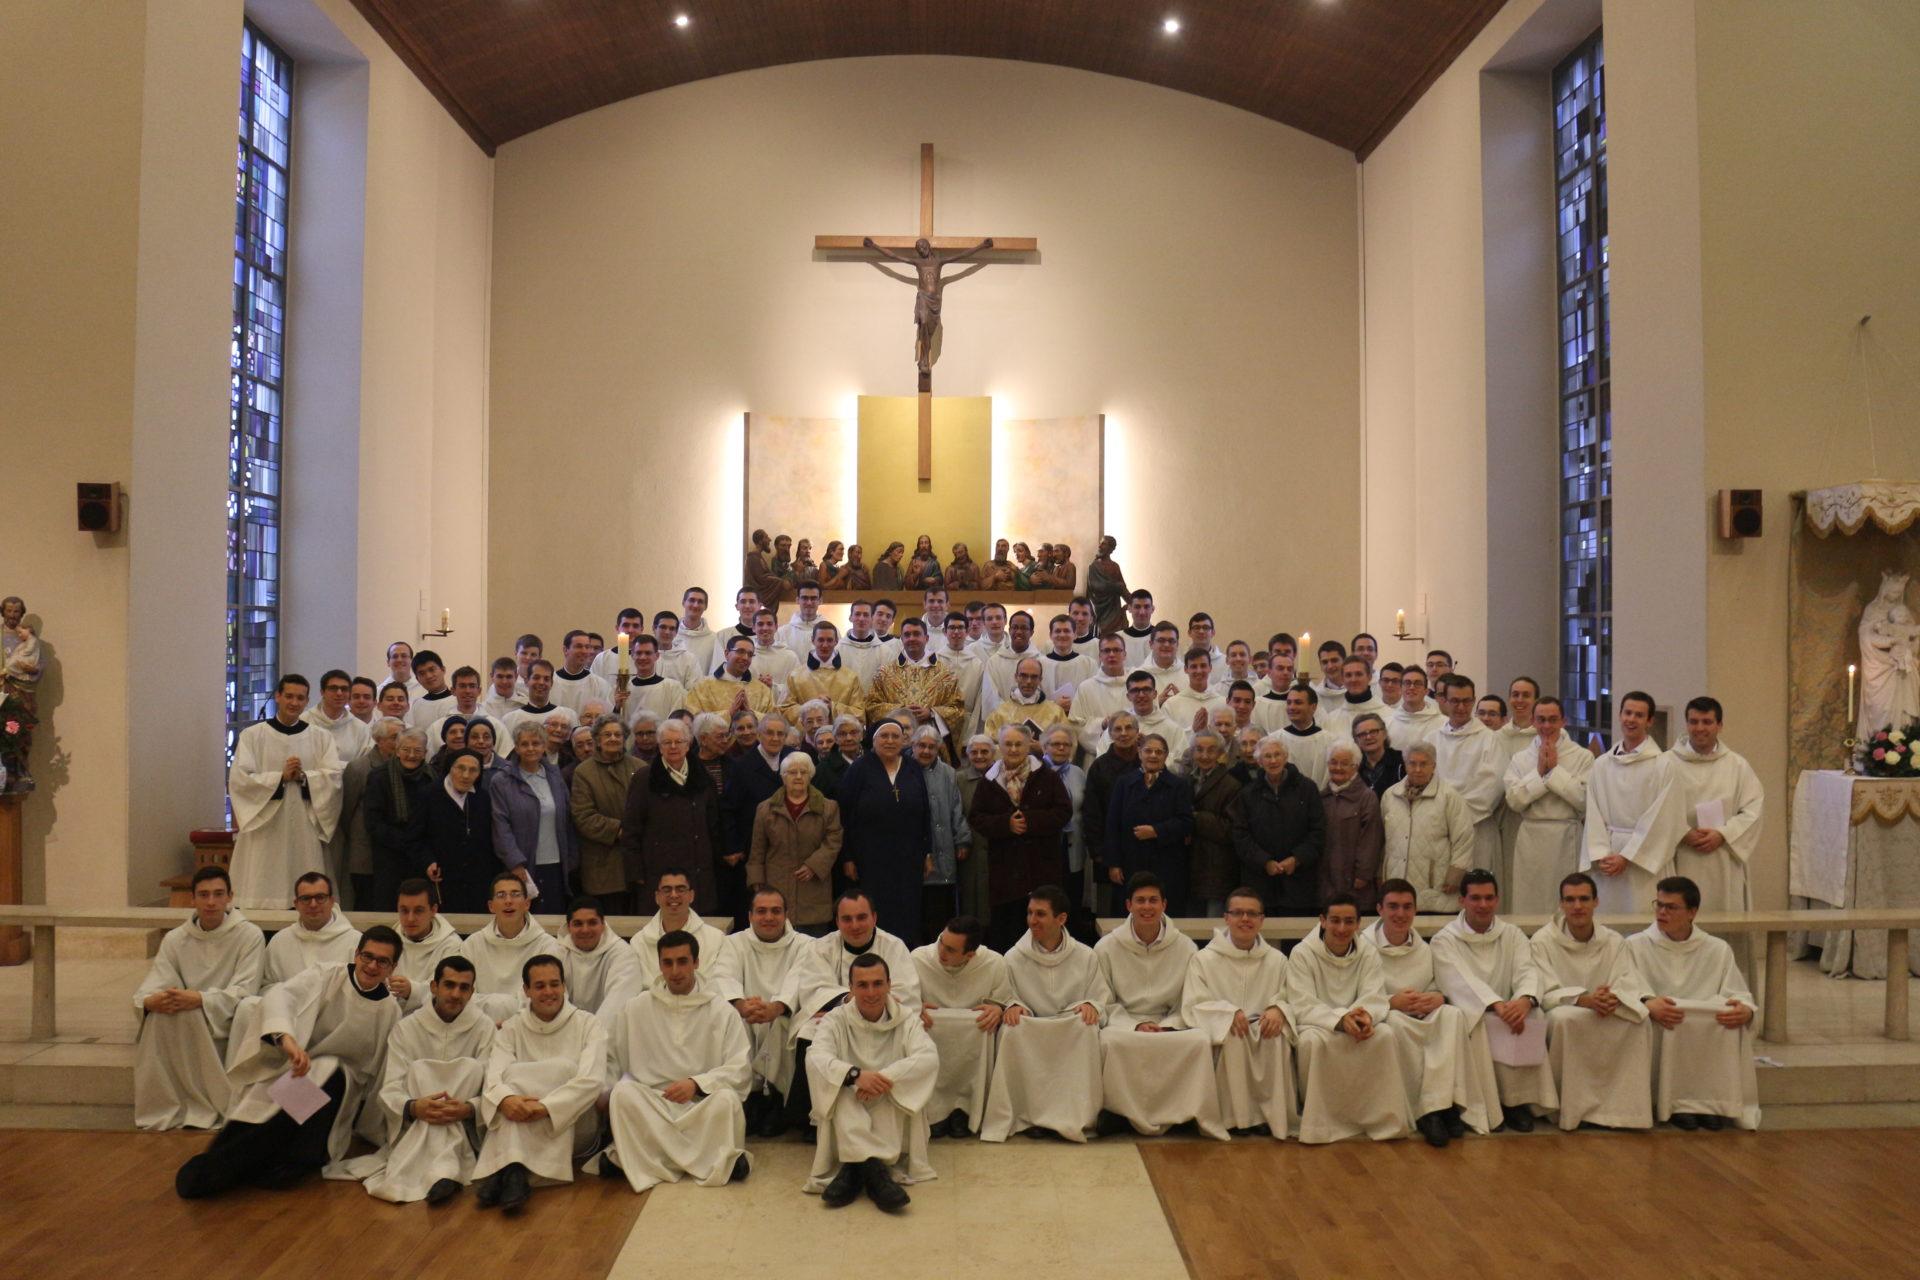 Caritas Pro Vitae Gradu, Charitable Trust, Fundraising Catholic NGOs, Ariane Slinger